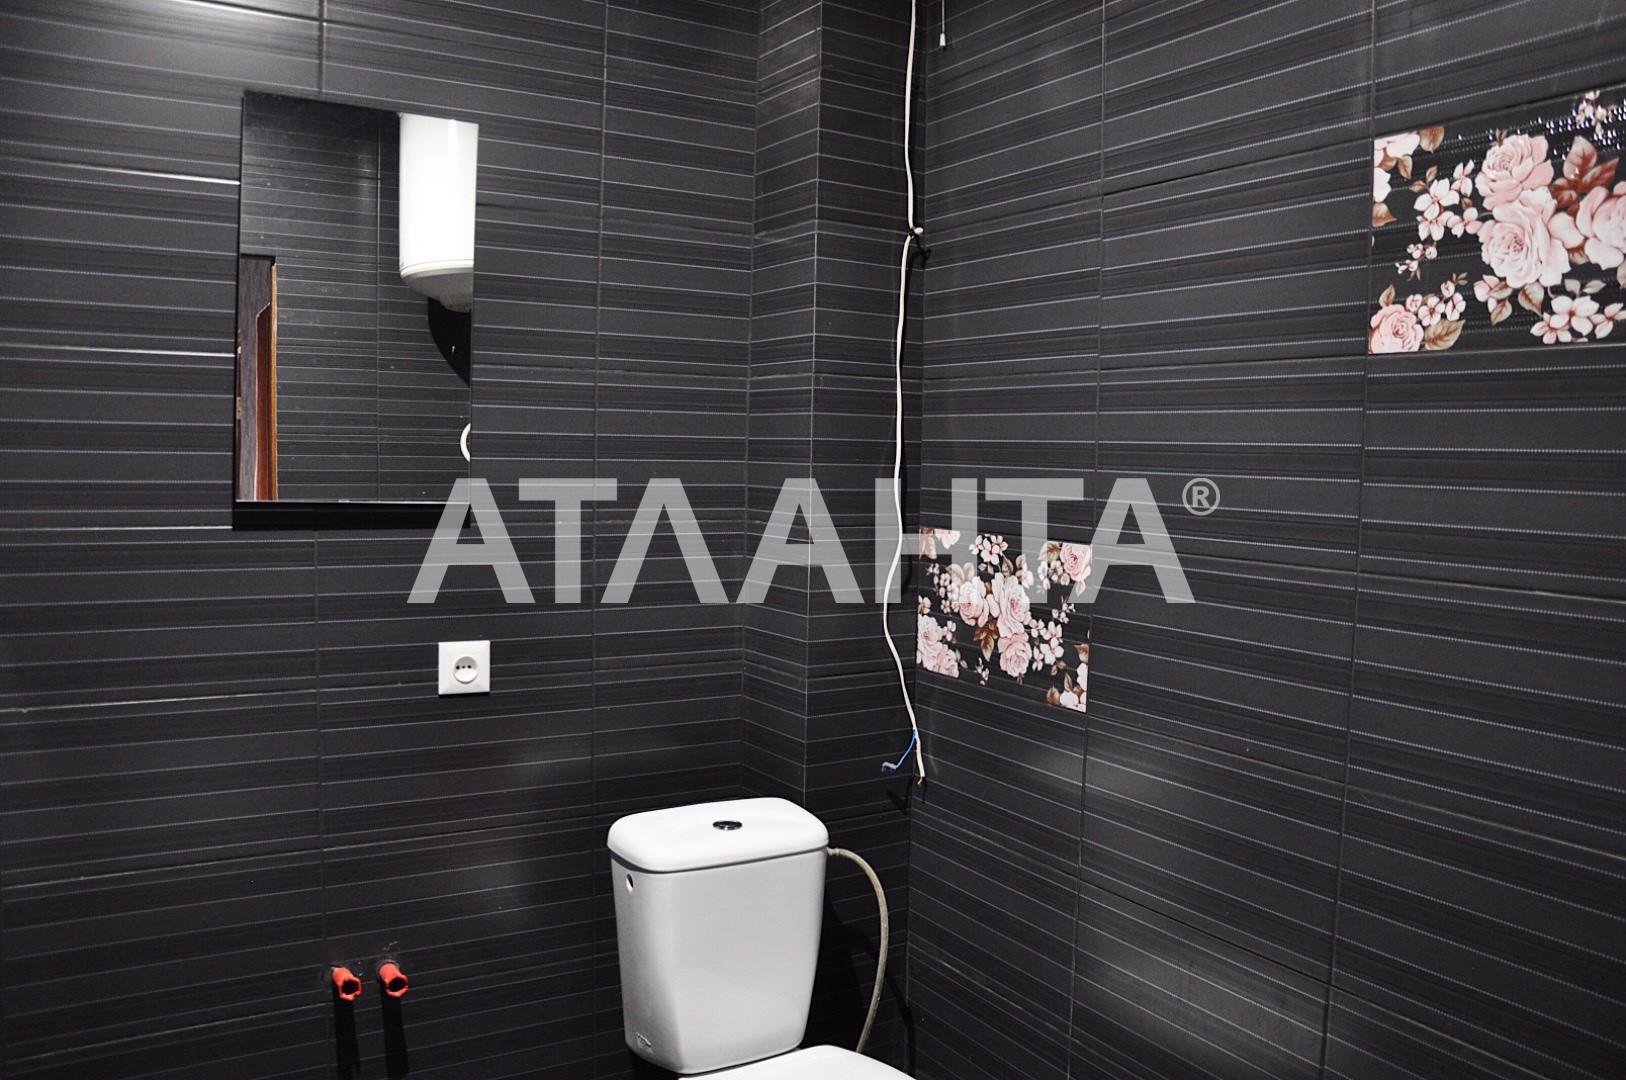 Продается 1-комнатная Квартира на ул. Радужный М-Н — 28 500 у.е. (фото №3)